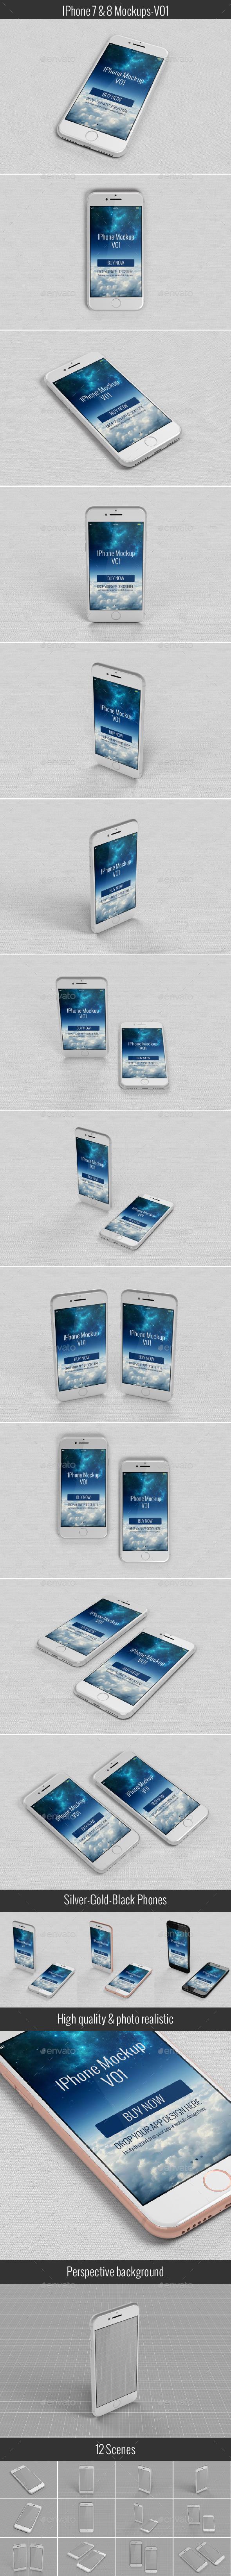 Phone Mock-Up Templates - Mobile Displays